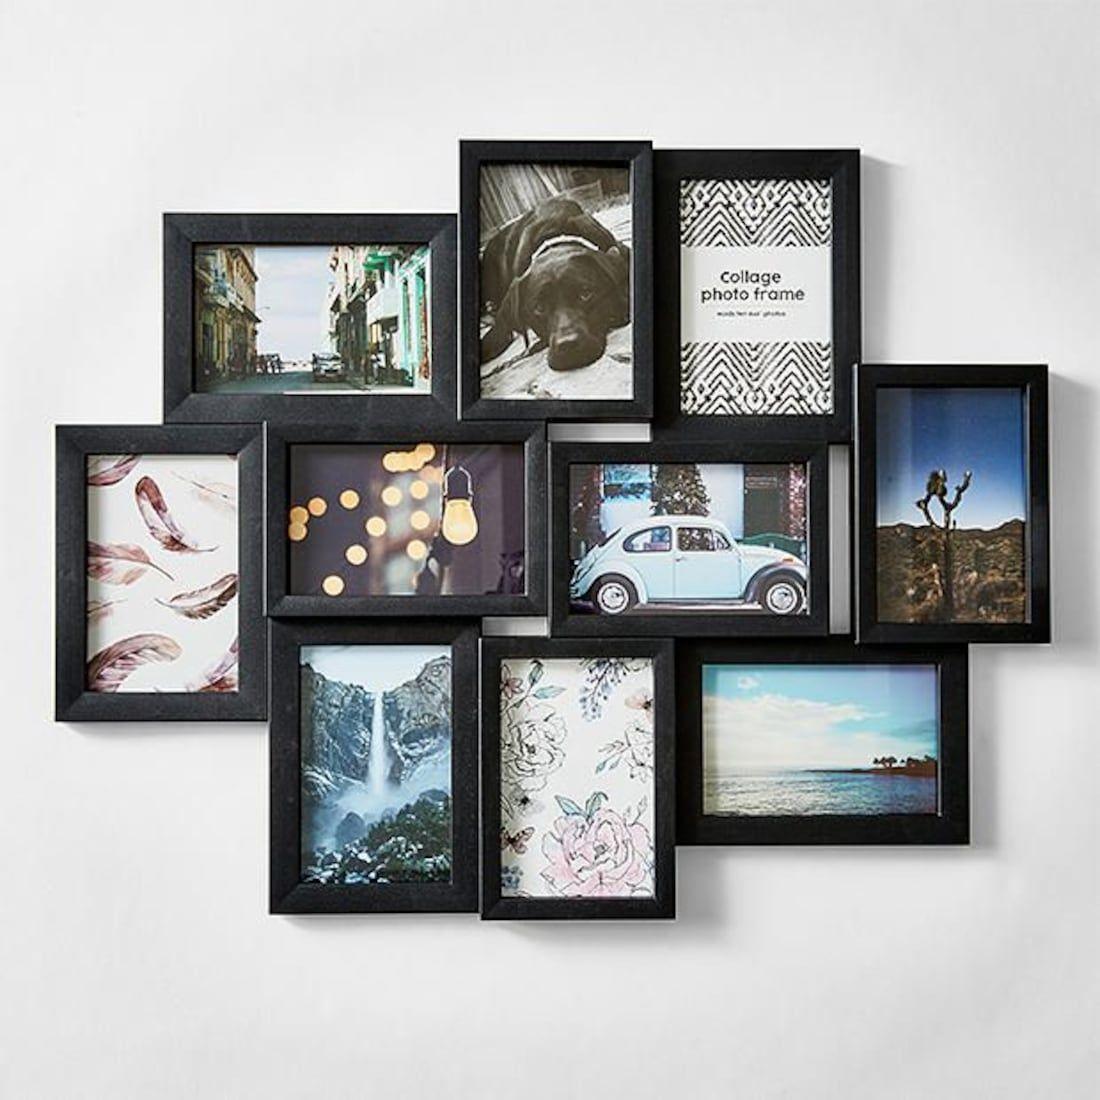 10 Window Collage Photo Frame Photo Collage Photo Frame Frame